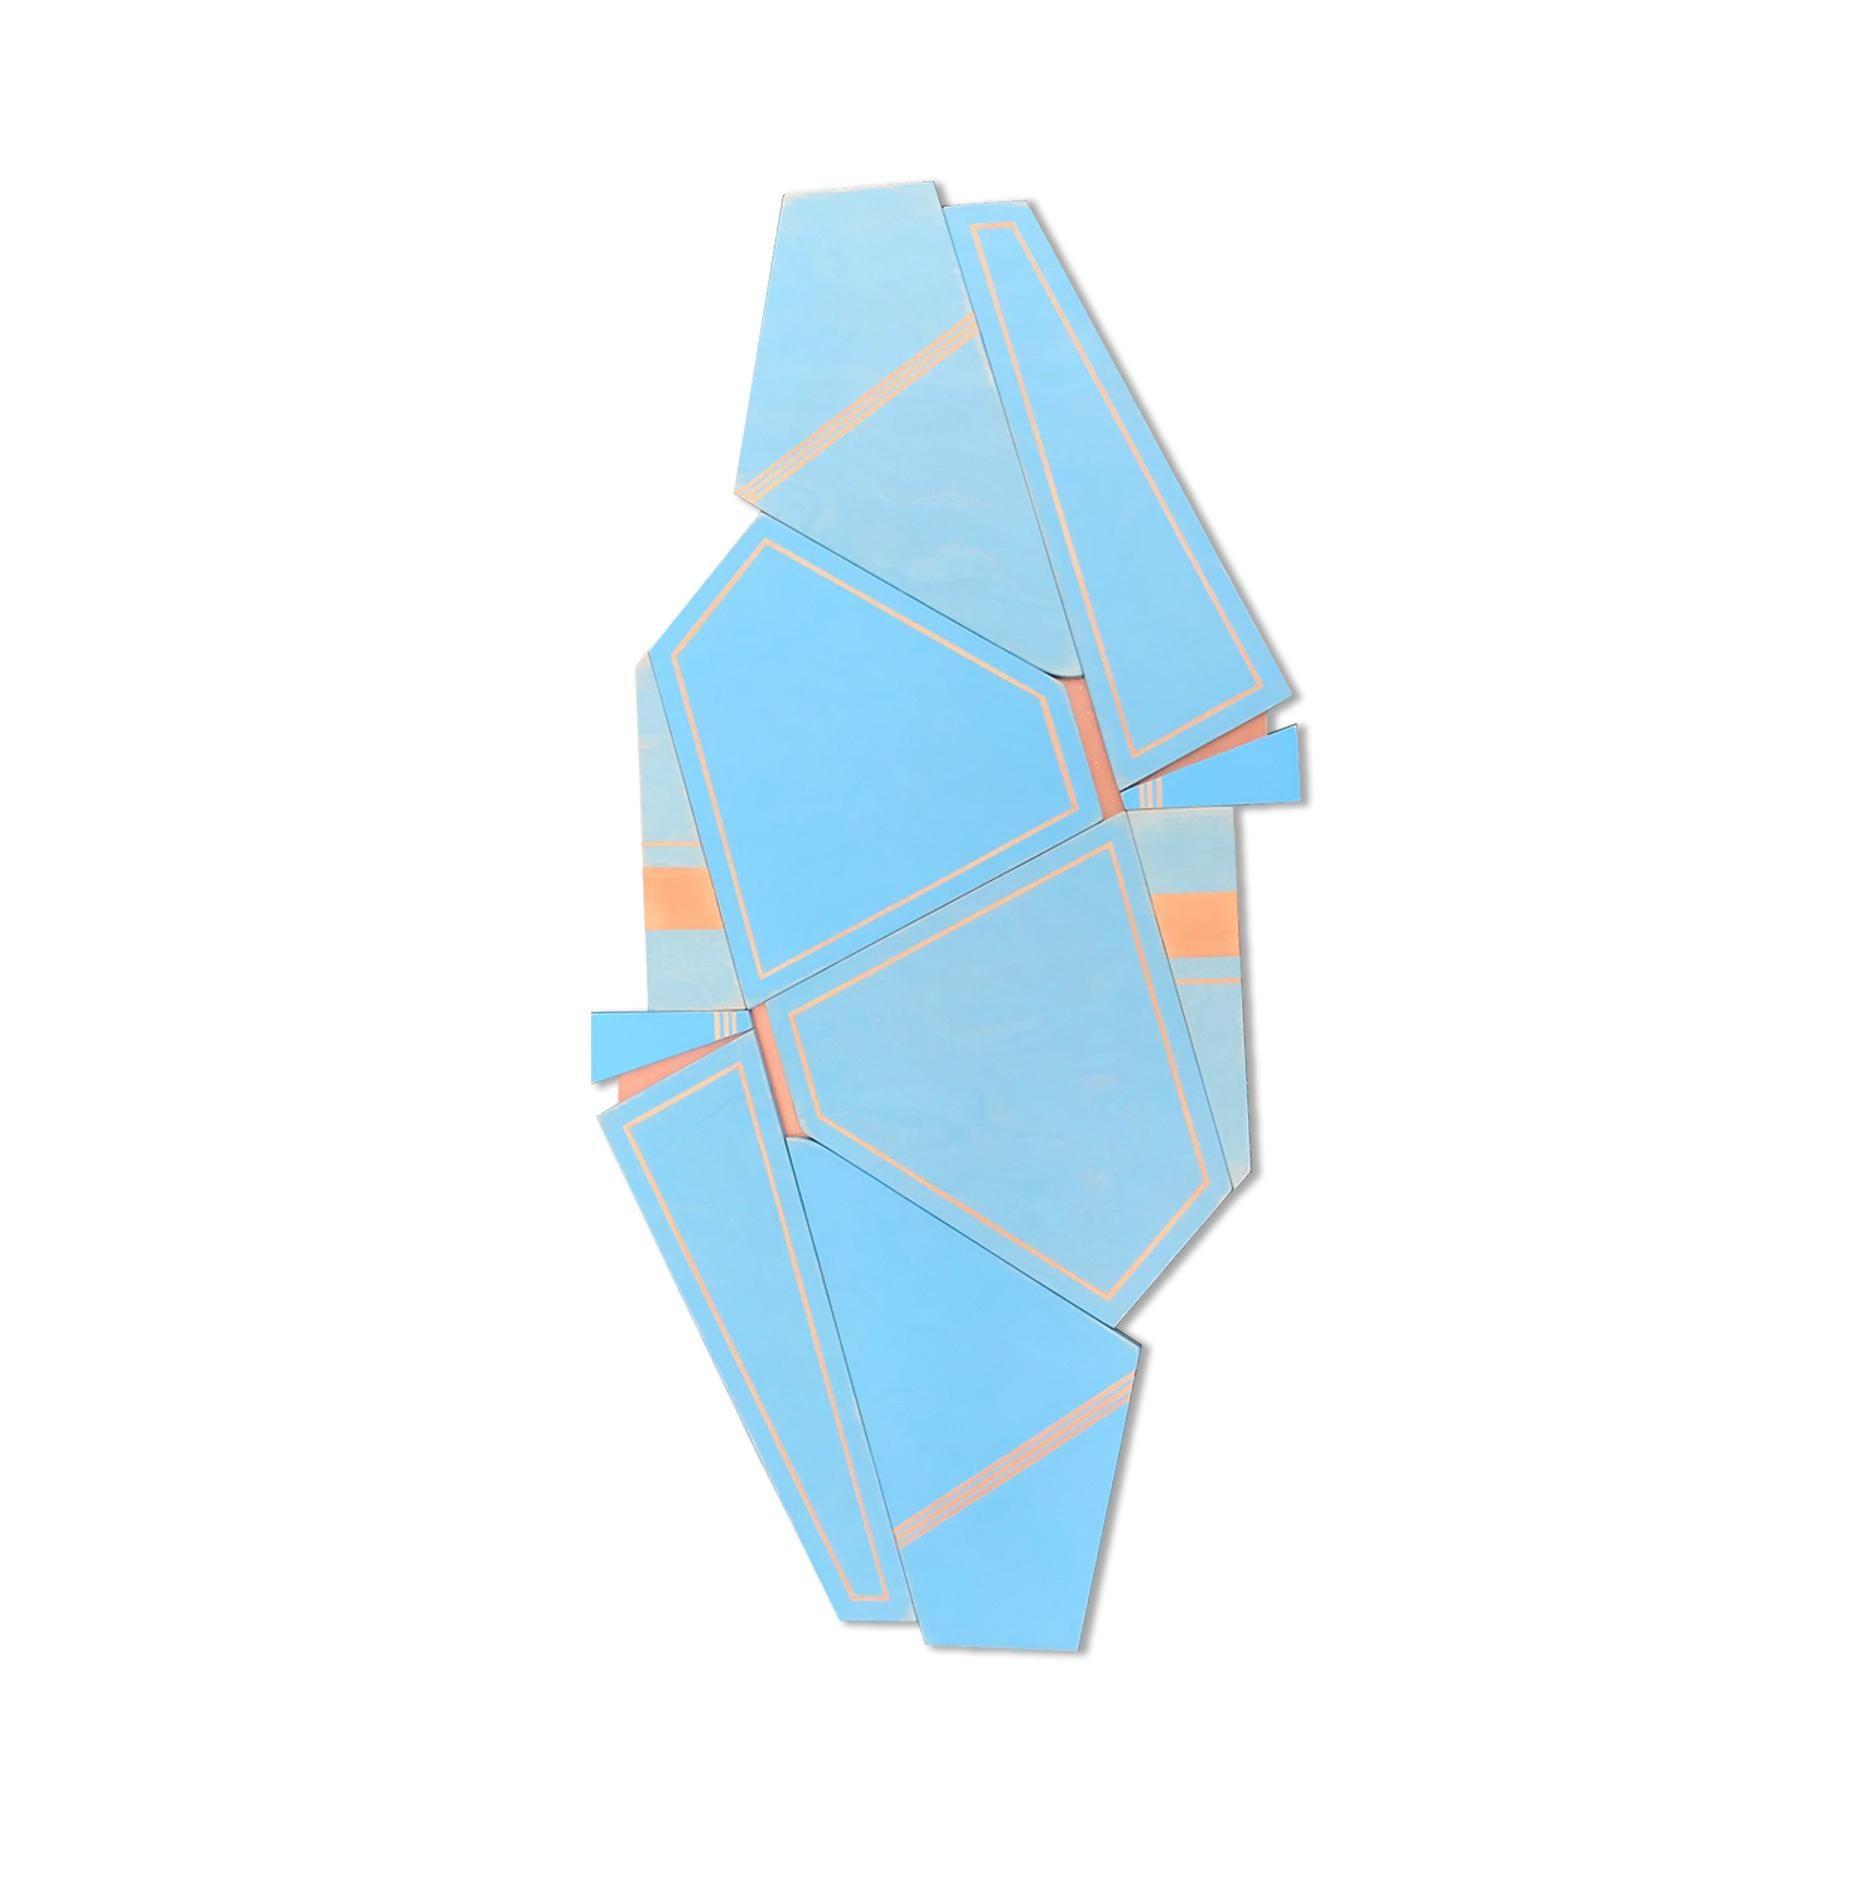 Space Candy II (wood art deco sky blue modern wall sculpture minimal geometric